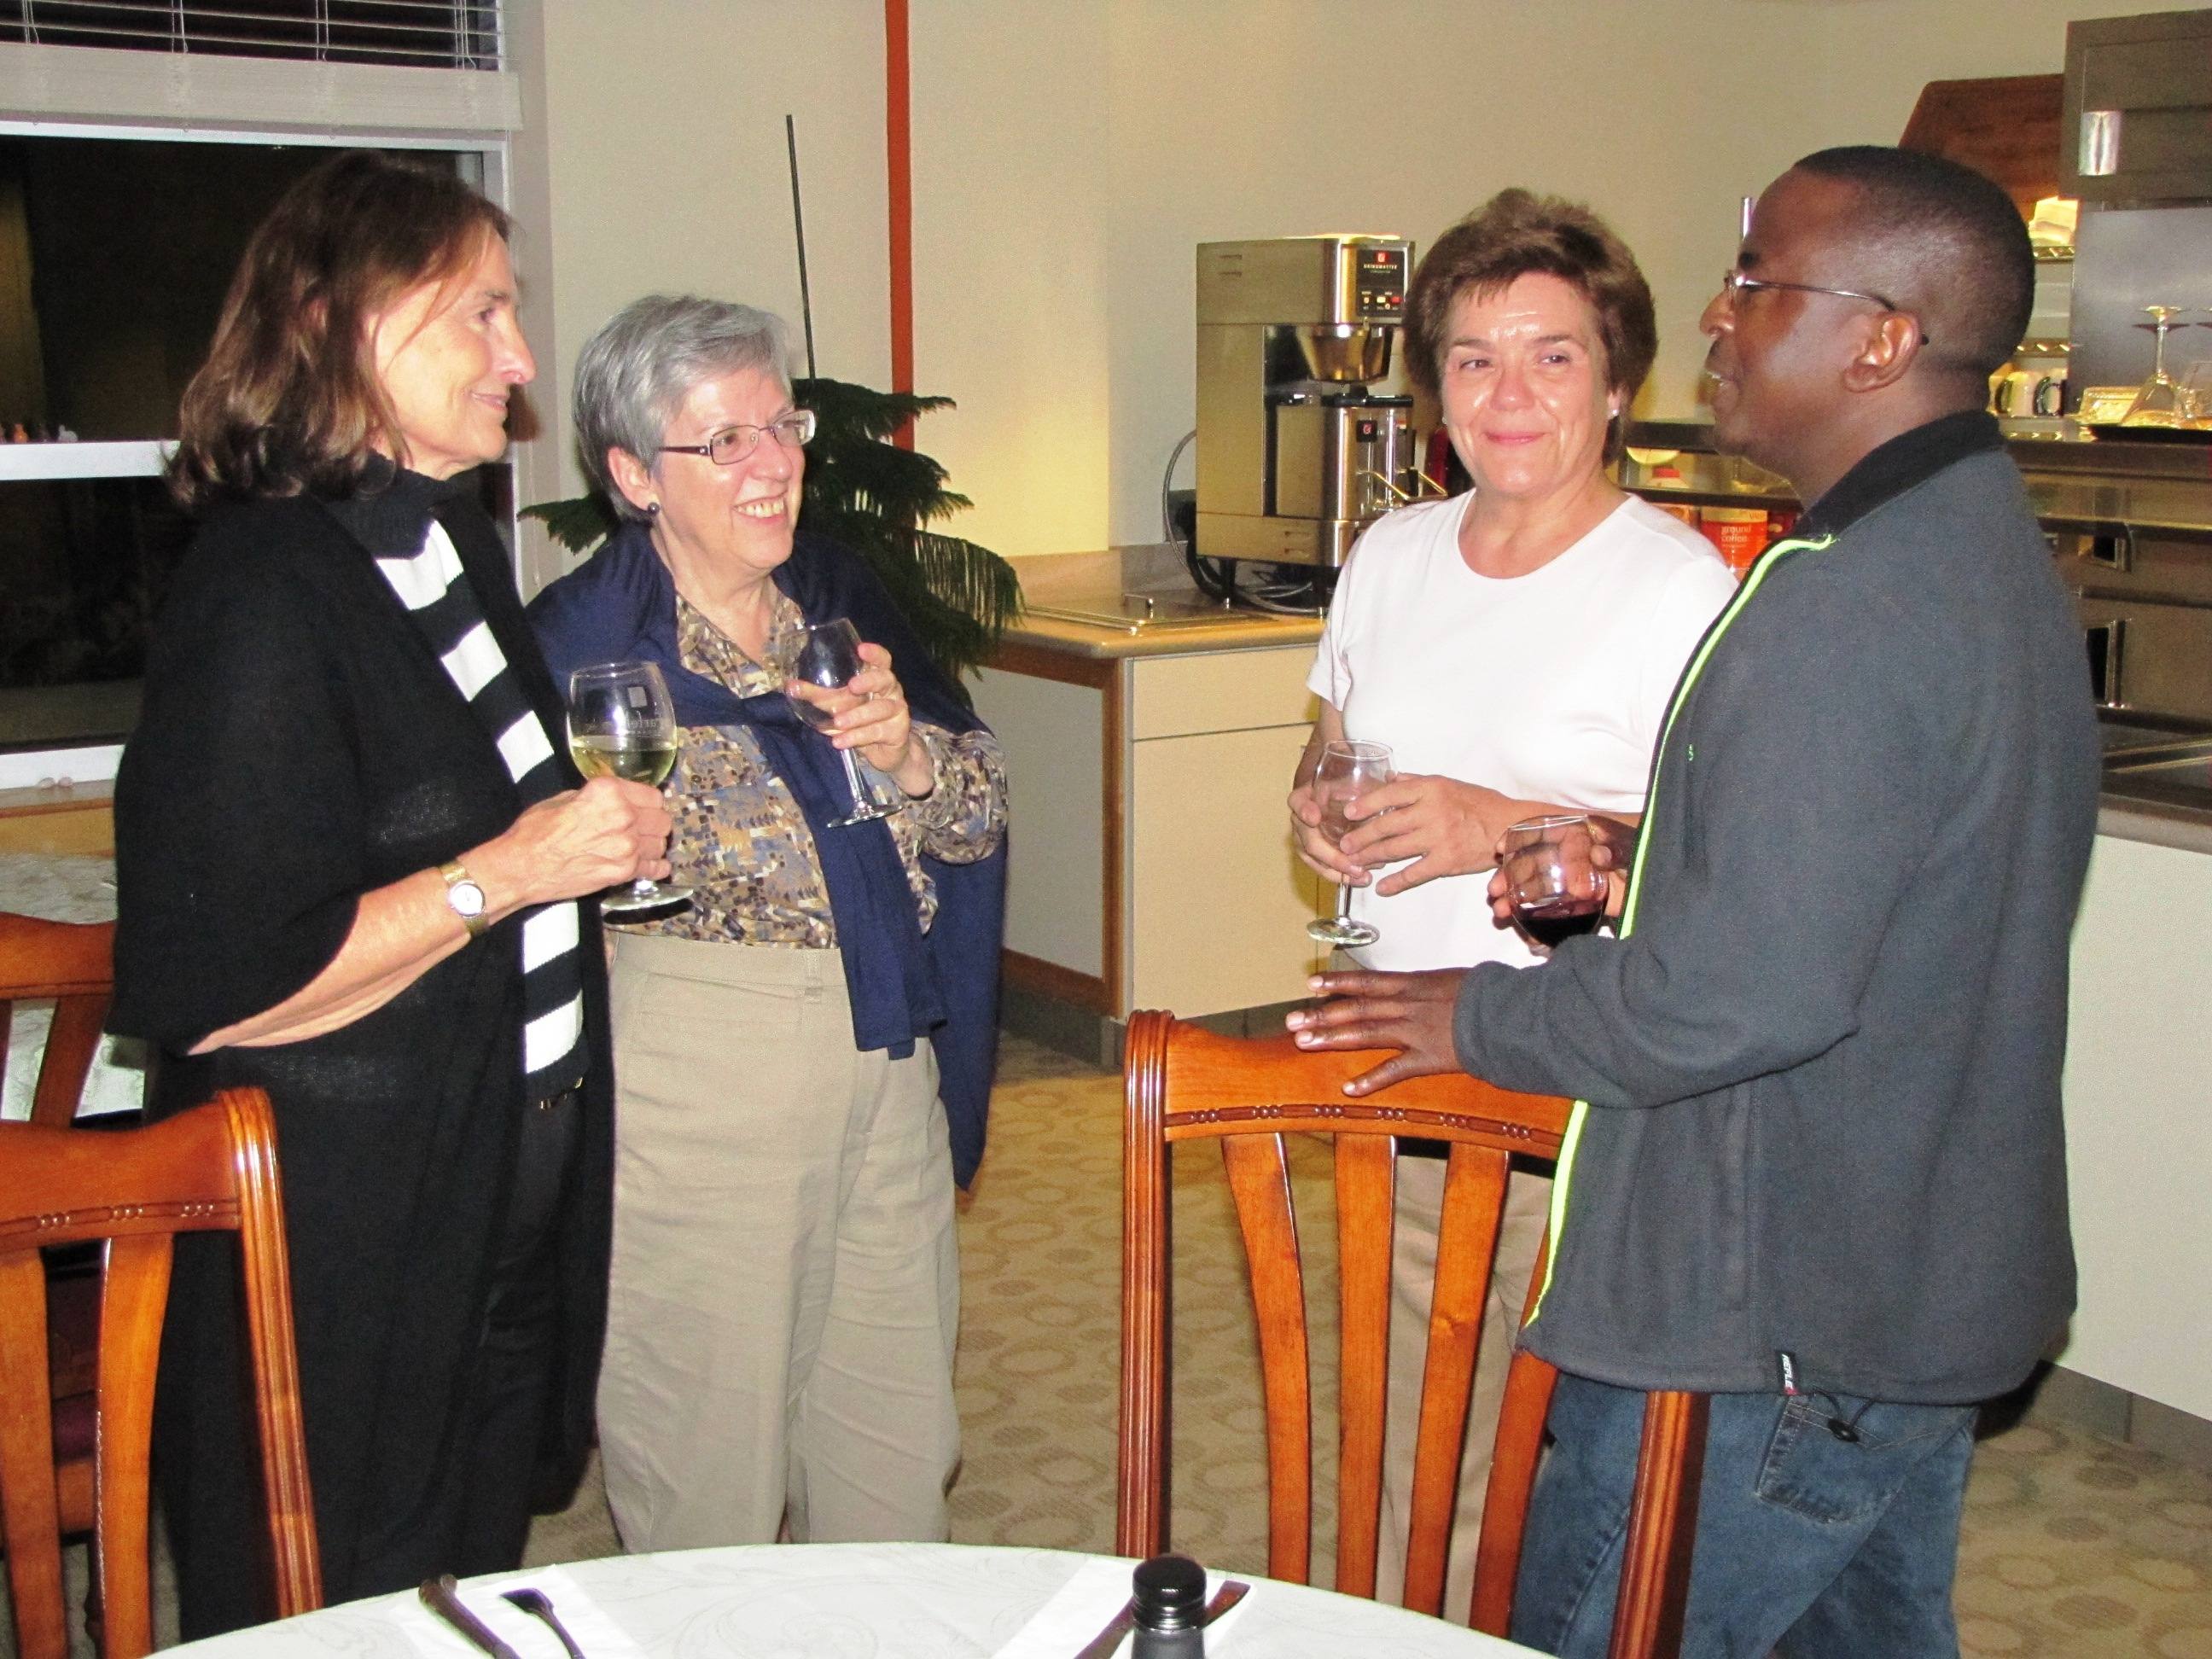 L-R Linda Scott, Graciela Etchart, and Diane Conoccholi listen to Fr. Barnabas Simatende, OMI at the Saturday night social